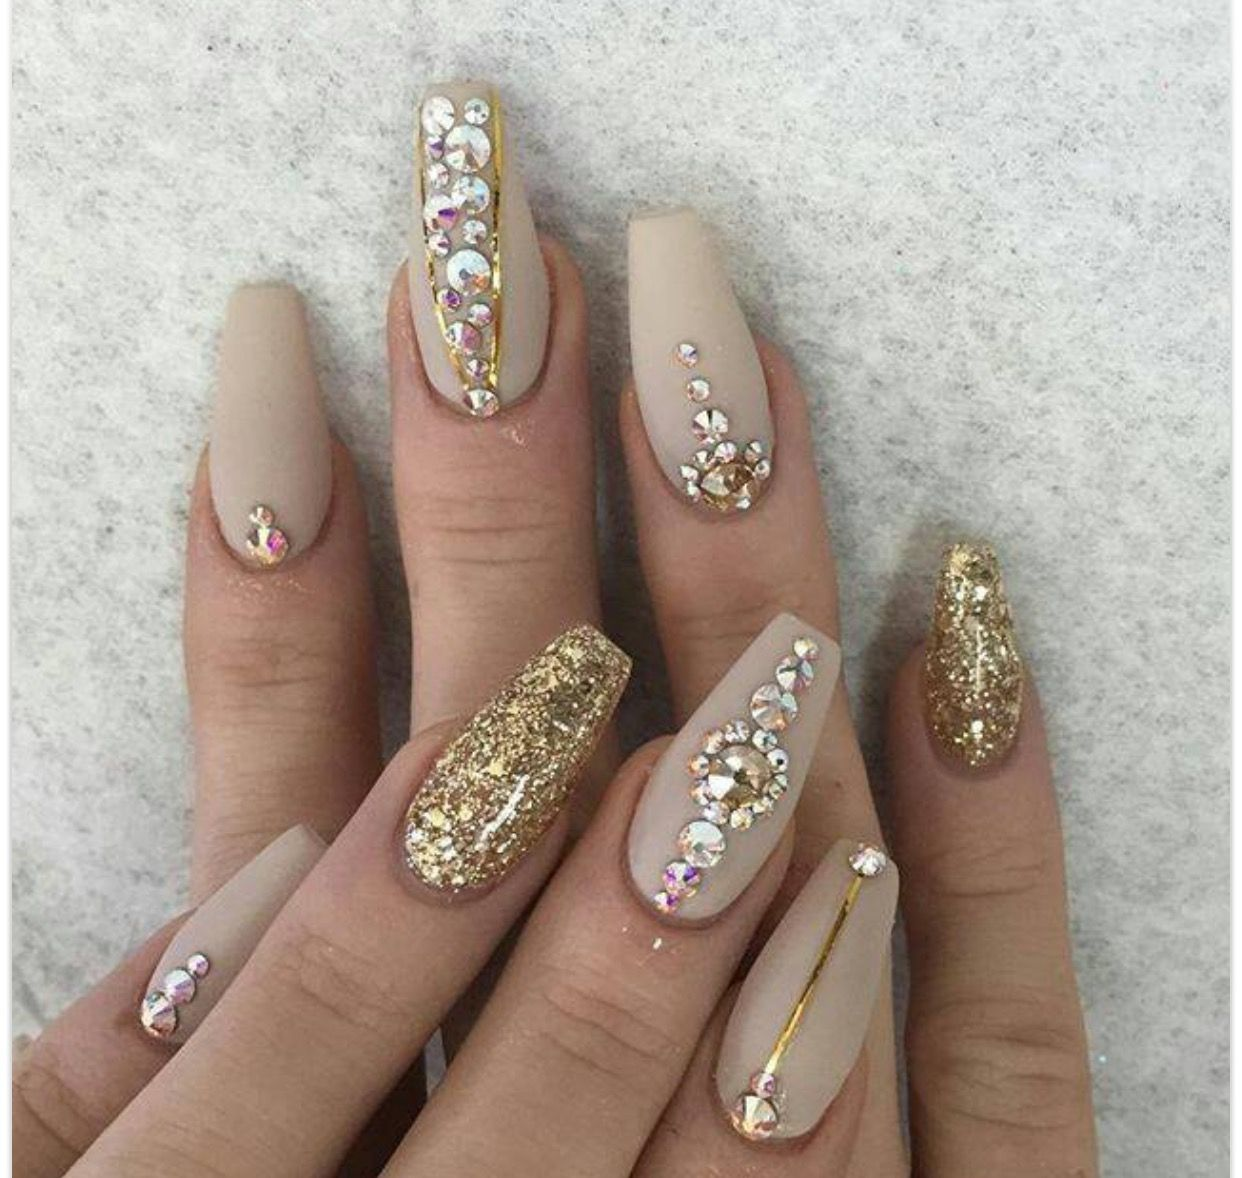 Pin von Alexa Carolina auf Nails   Pinterest   Fingernägel